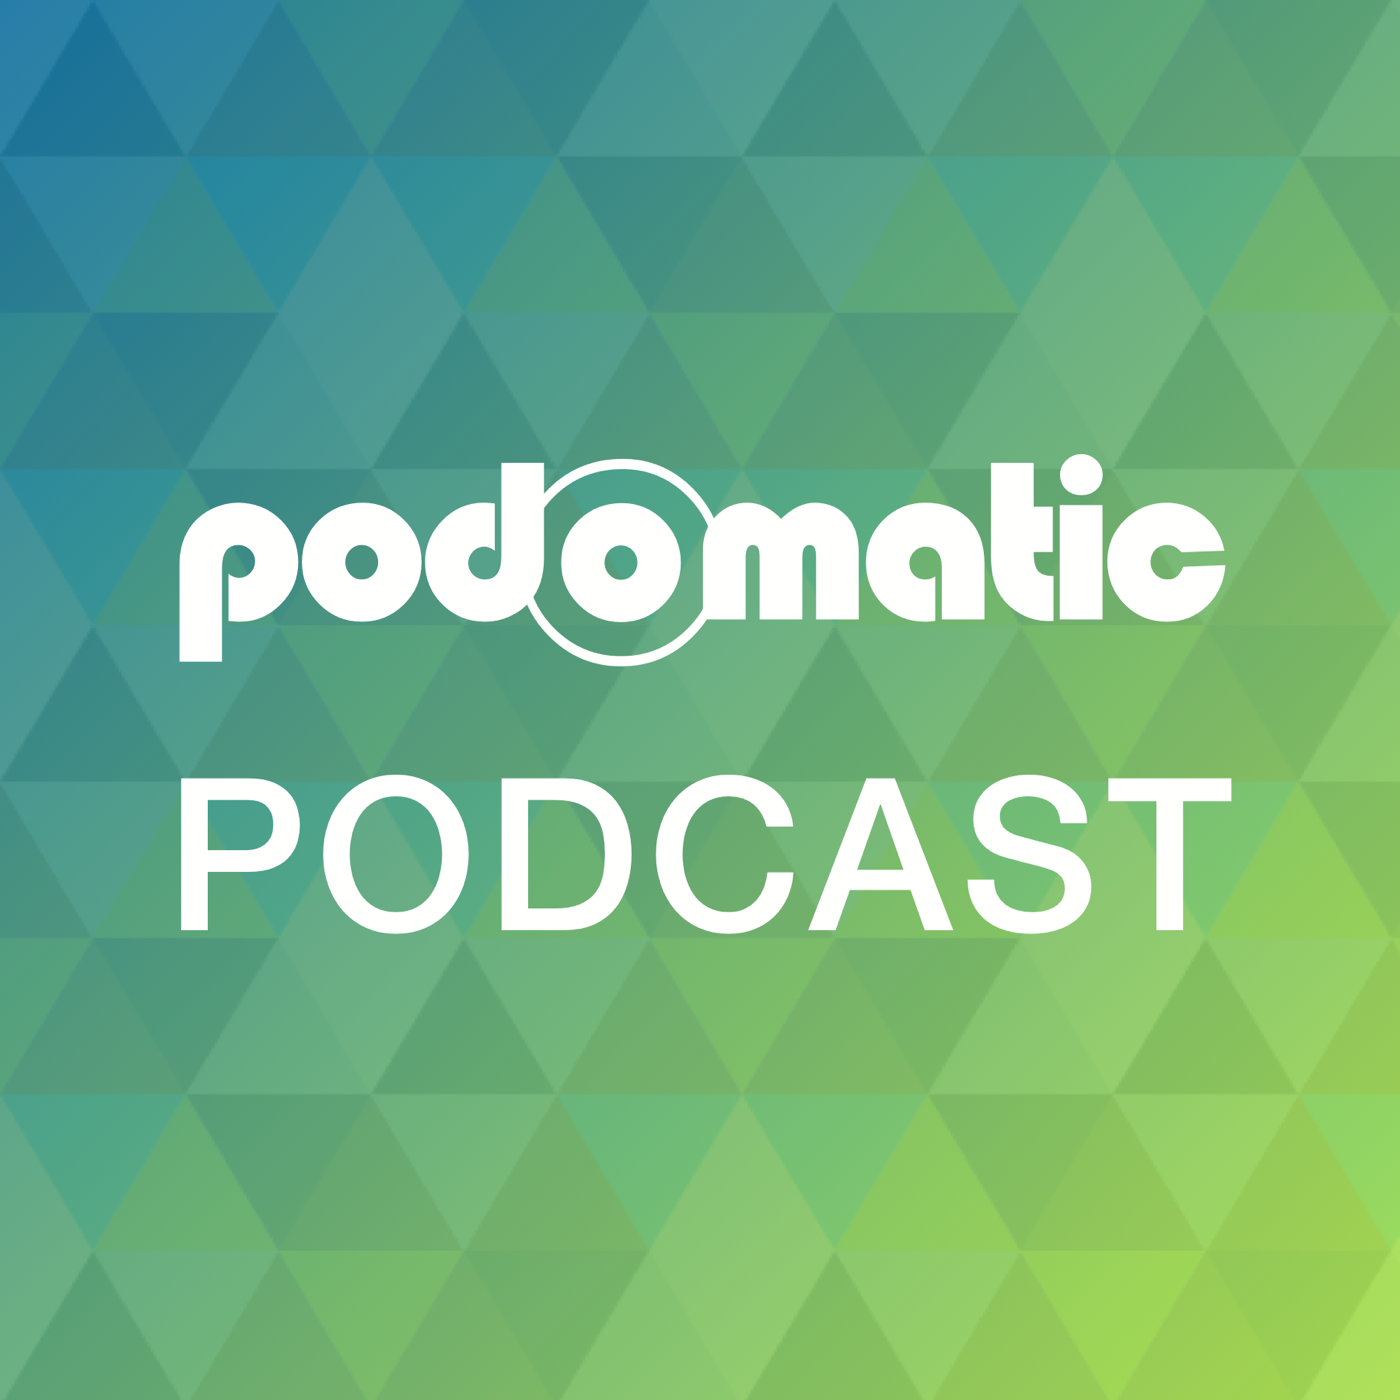 Carlos Barcelo Fernandez's Podcast